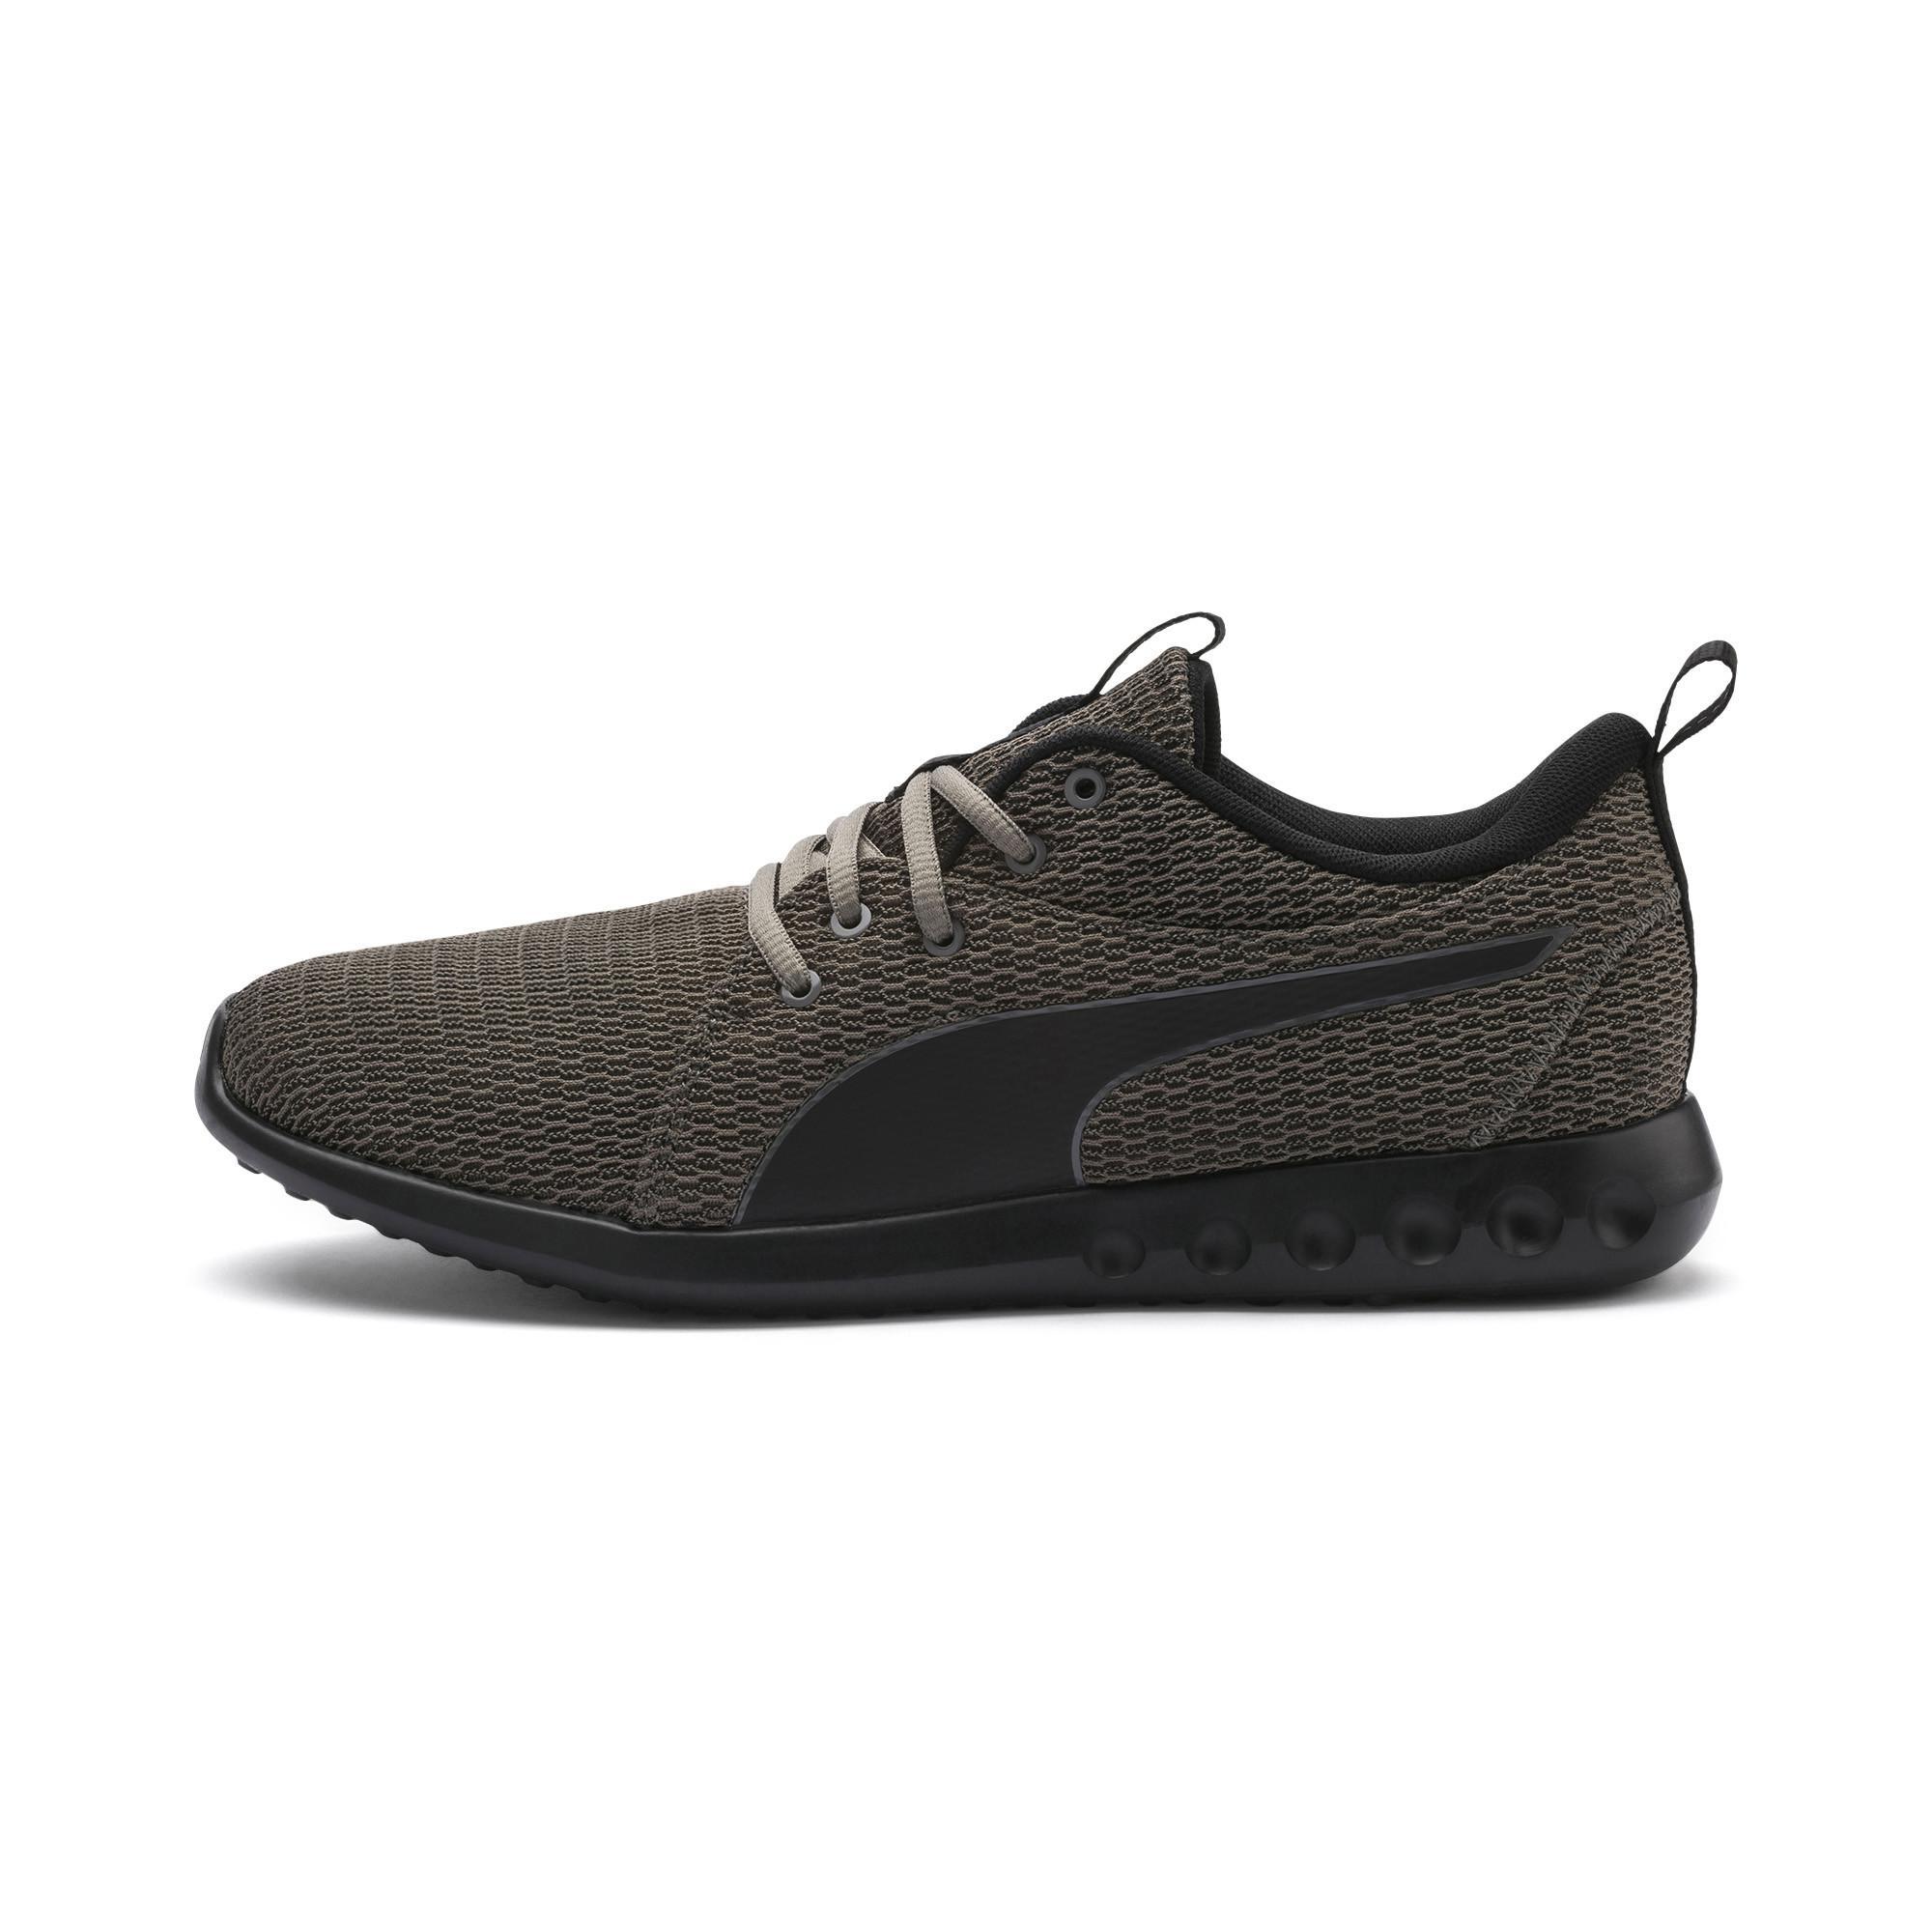 4e70ecd08a7 Lyst - PUMA Carson 2 New Core Men s Running Shoes in Black for Men ...